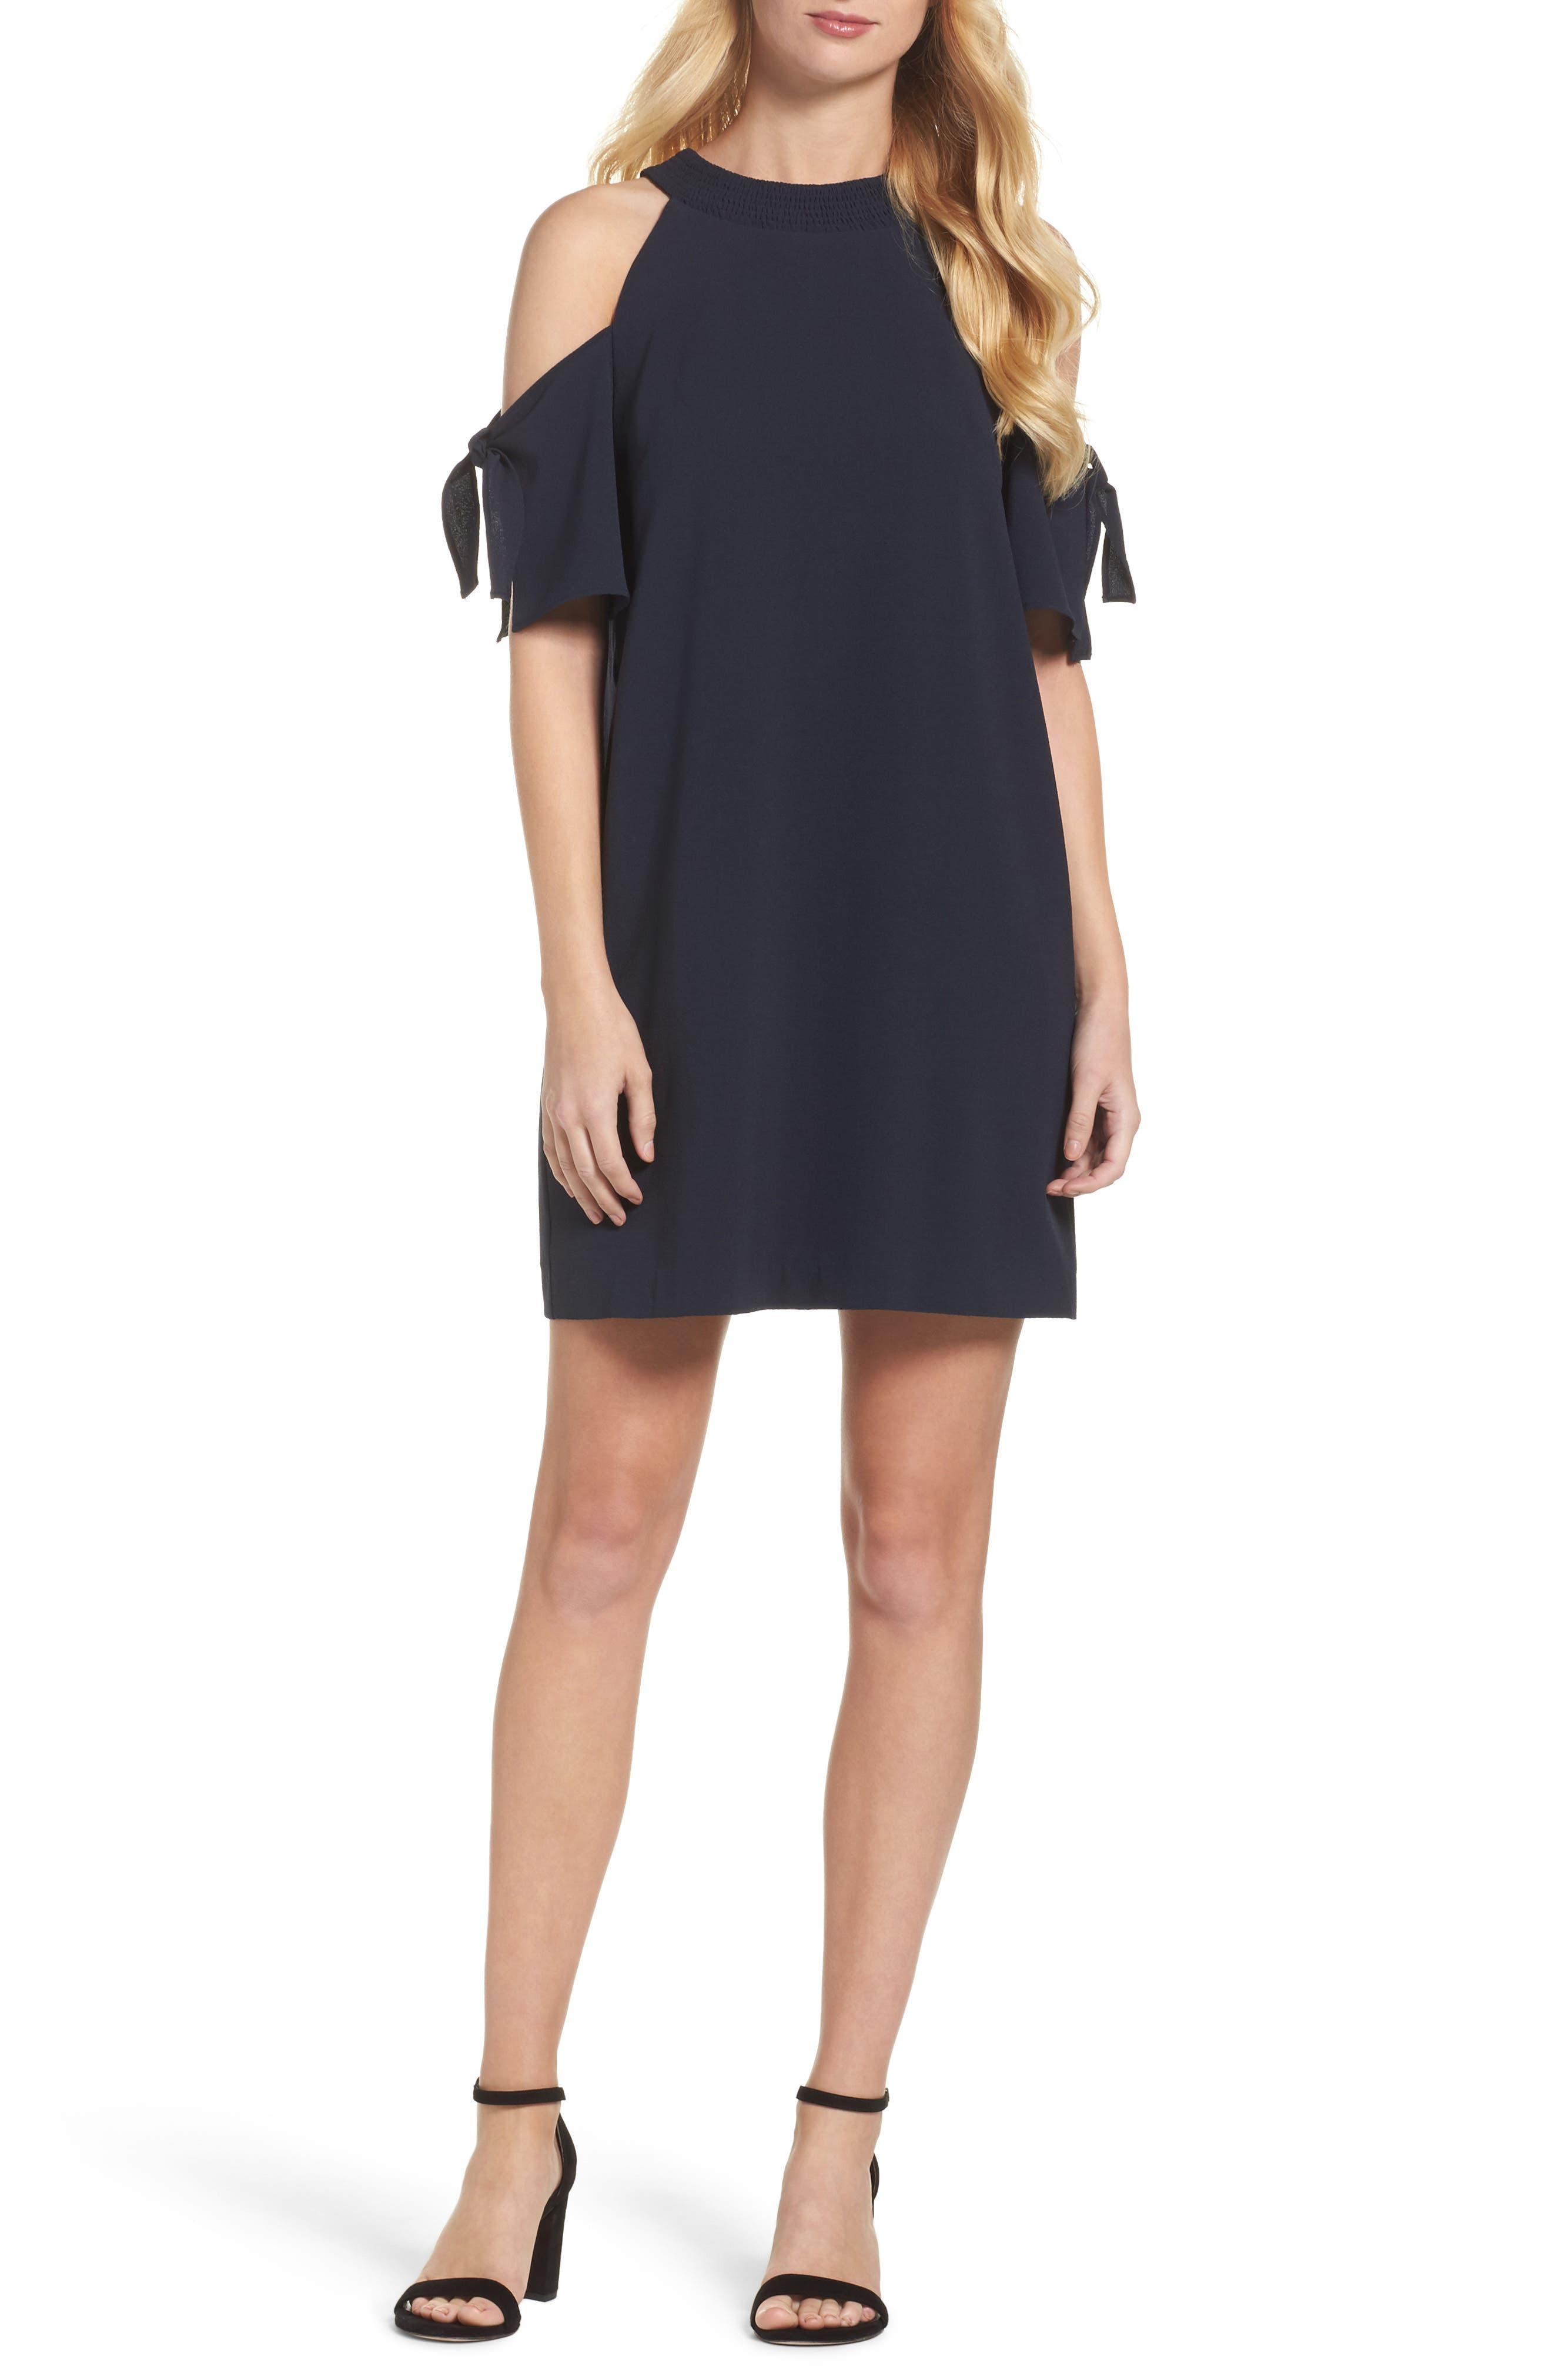 FELICITY & COCO Cold Shoulder Shift Dress